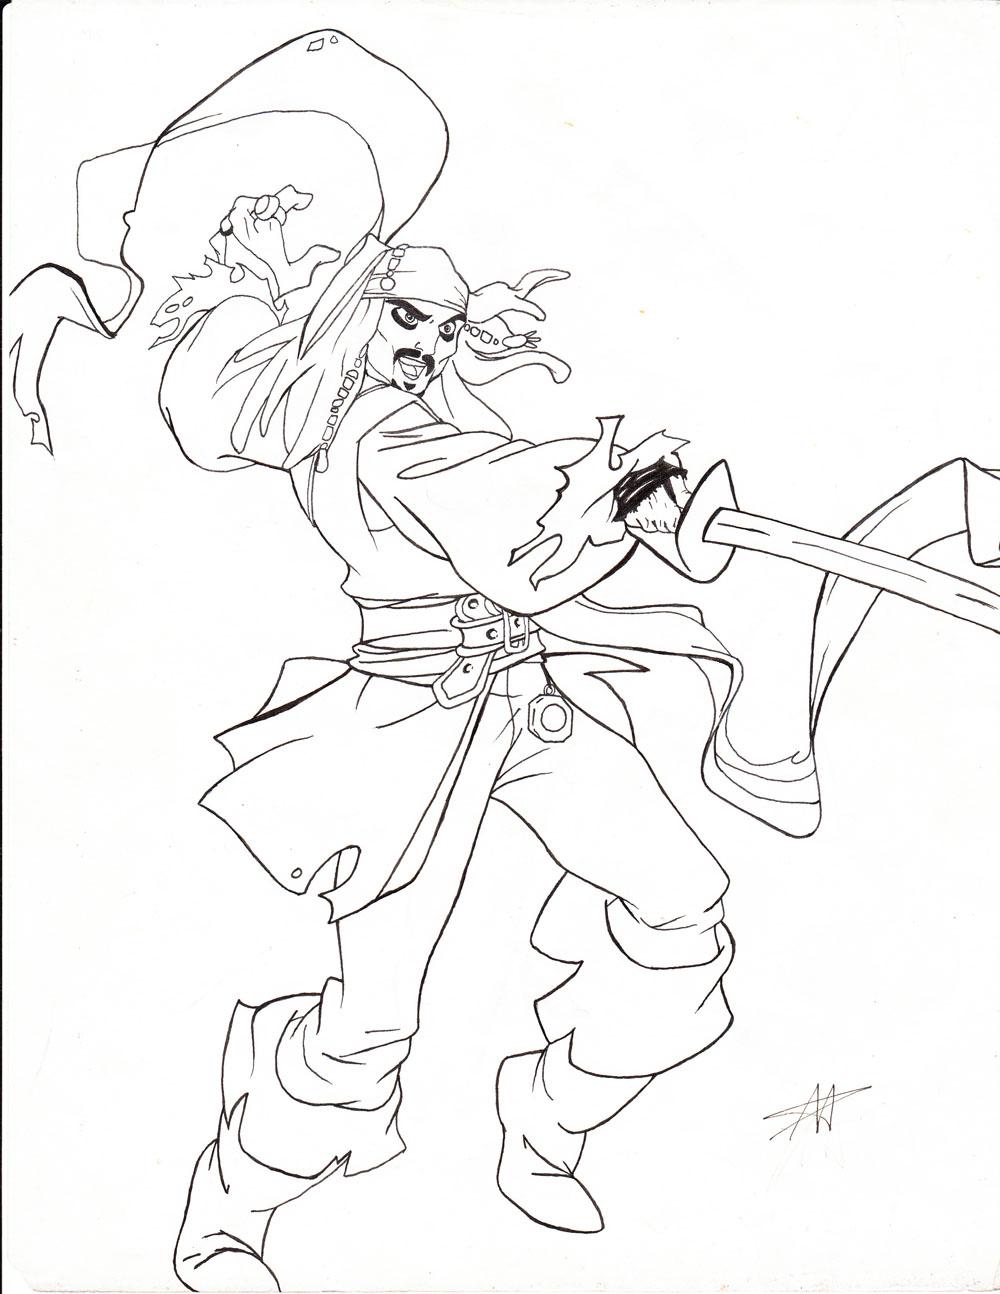 Captain Jack Sparrow-line art by DisneyFan-01 on DeviantArt